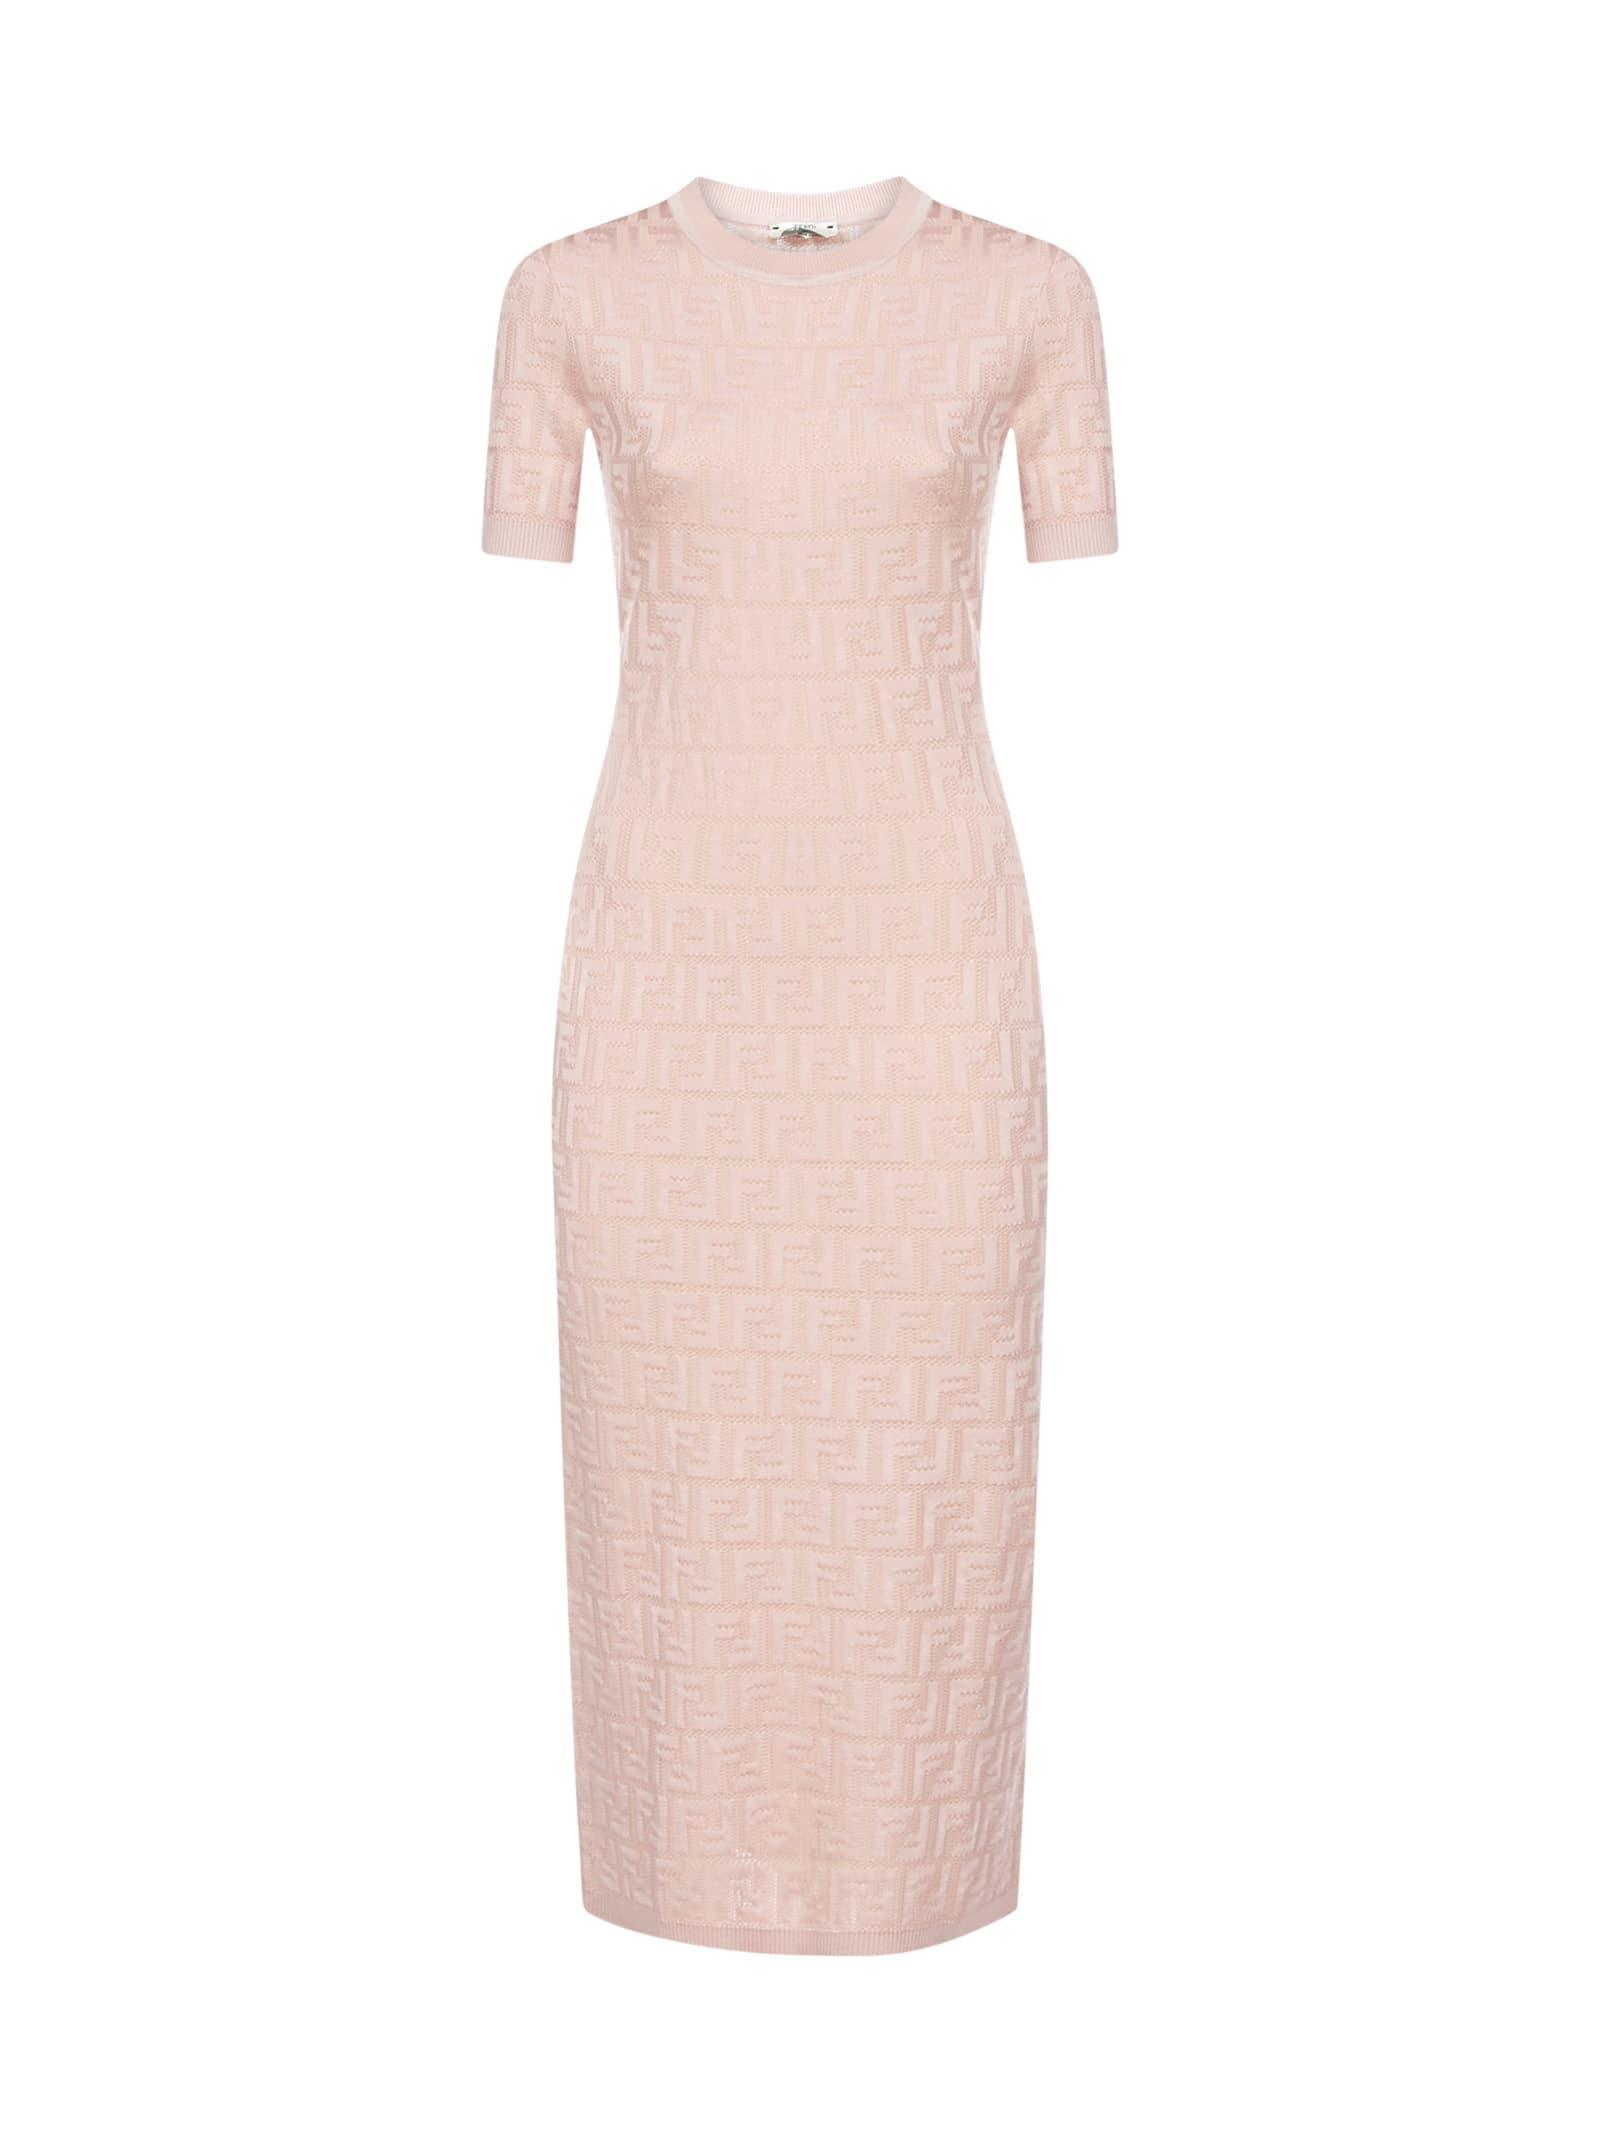 Buy Fendi Short Sleeves Ff Dress online, shop Fendi with free shipping